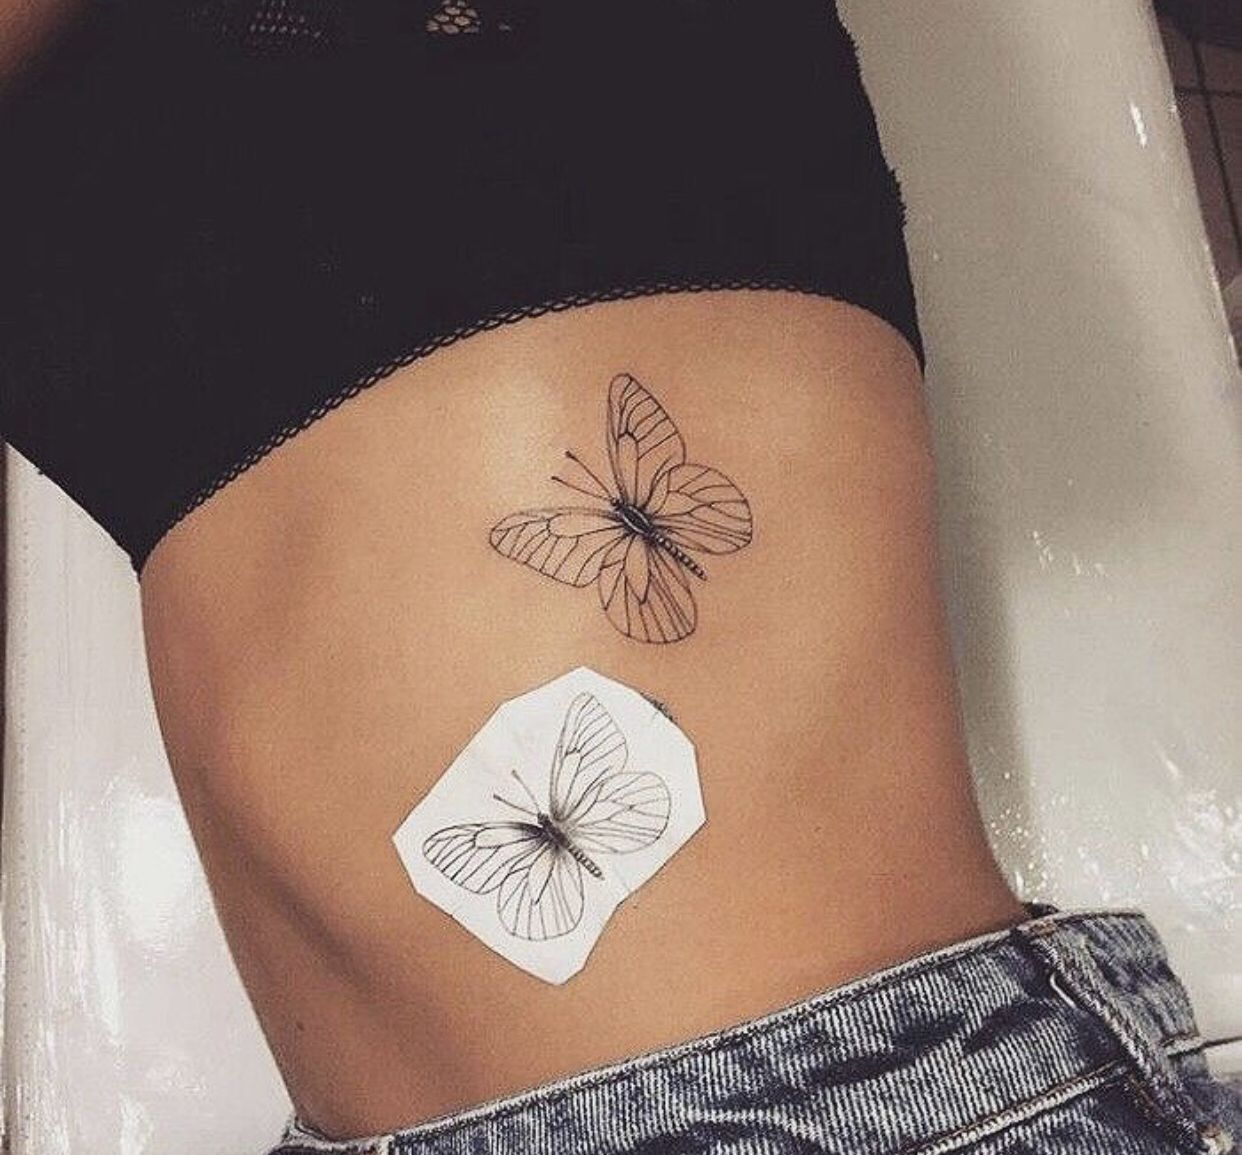 Follow Z I N N O B E A R Girly Tattoos Small Tattoos Tattoos